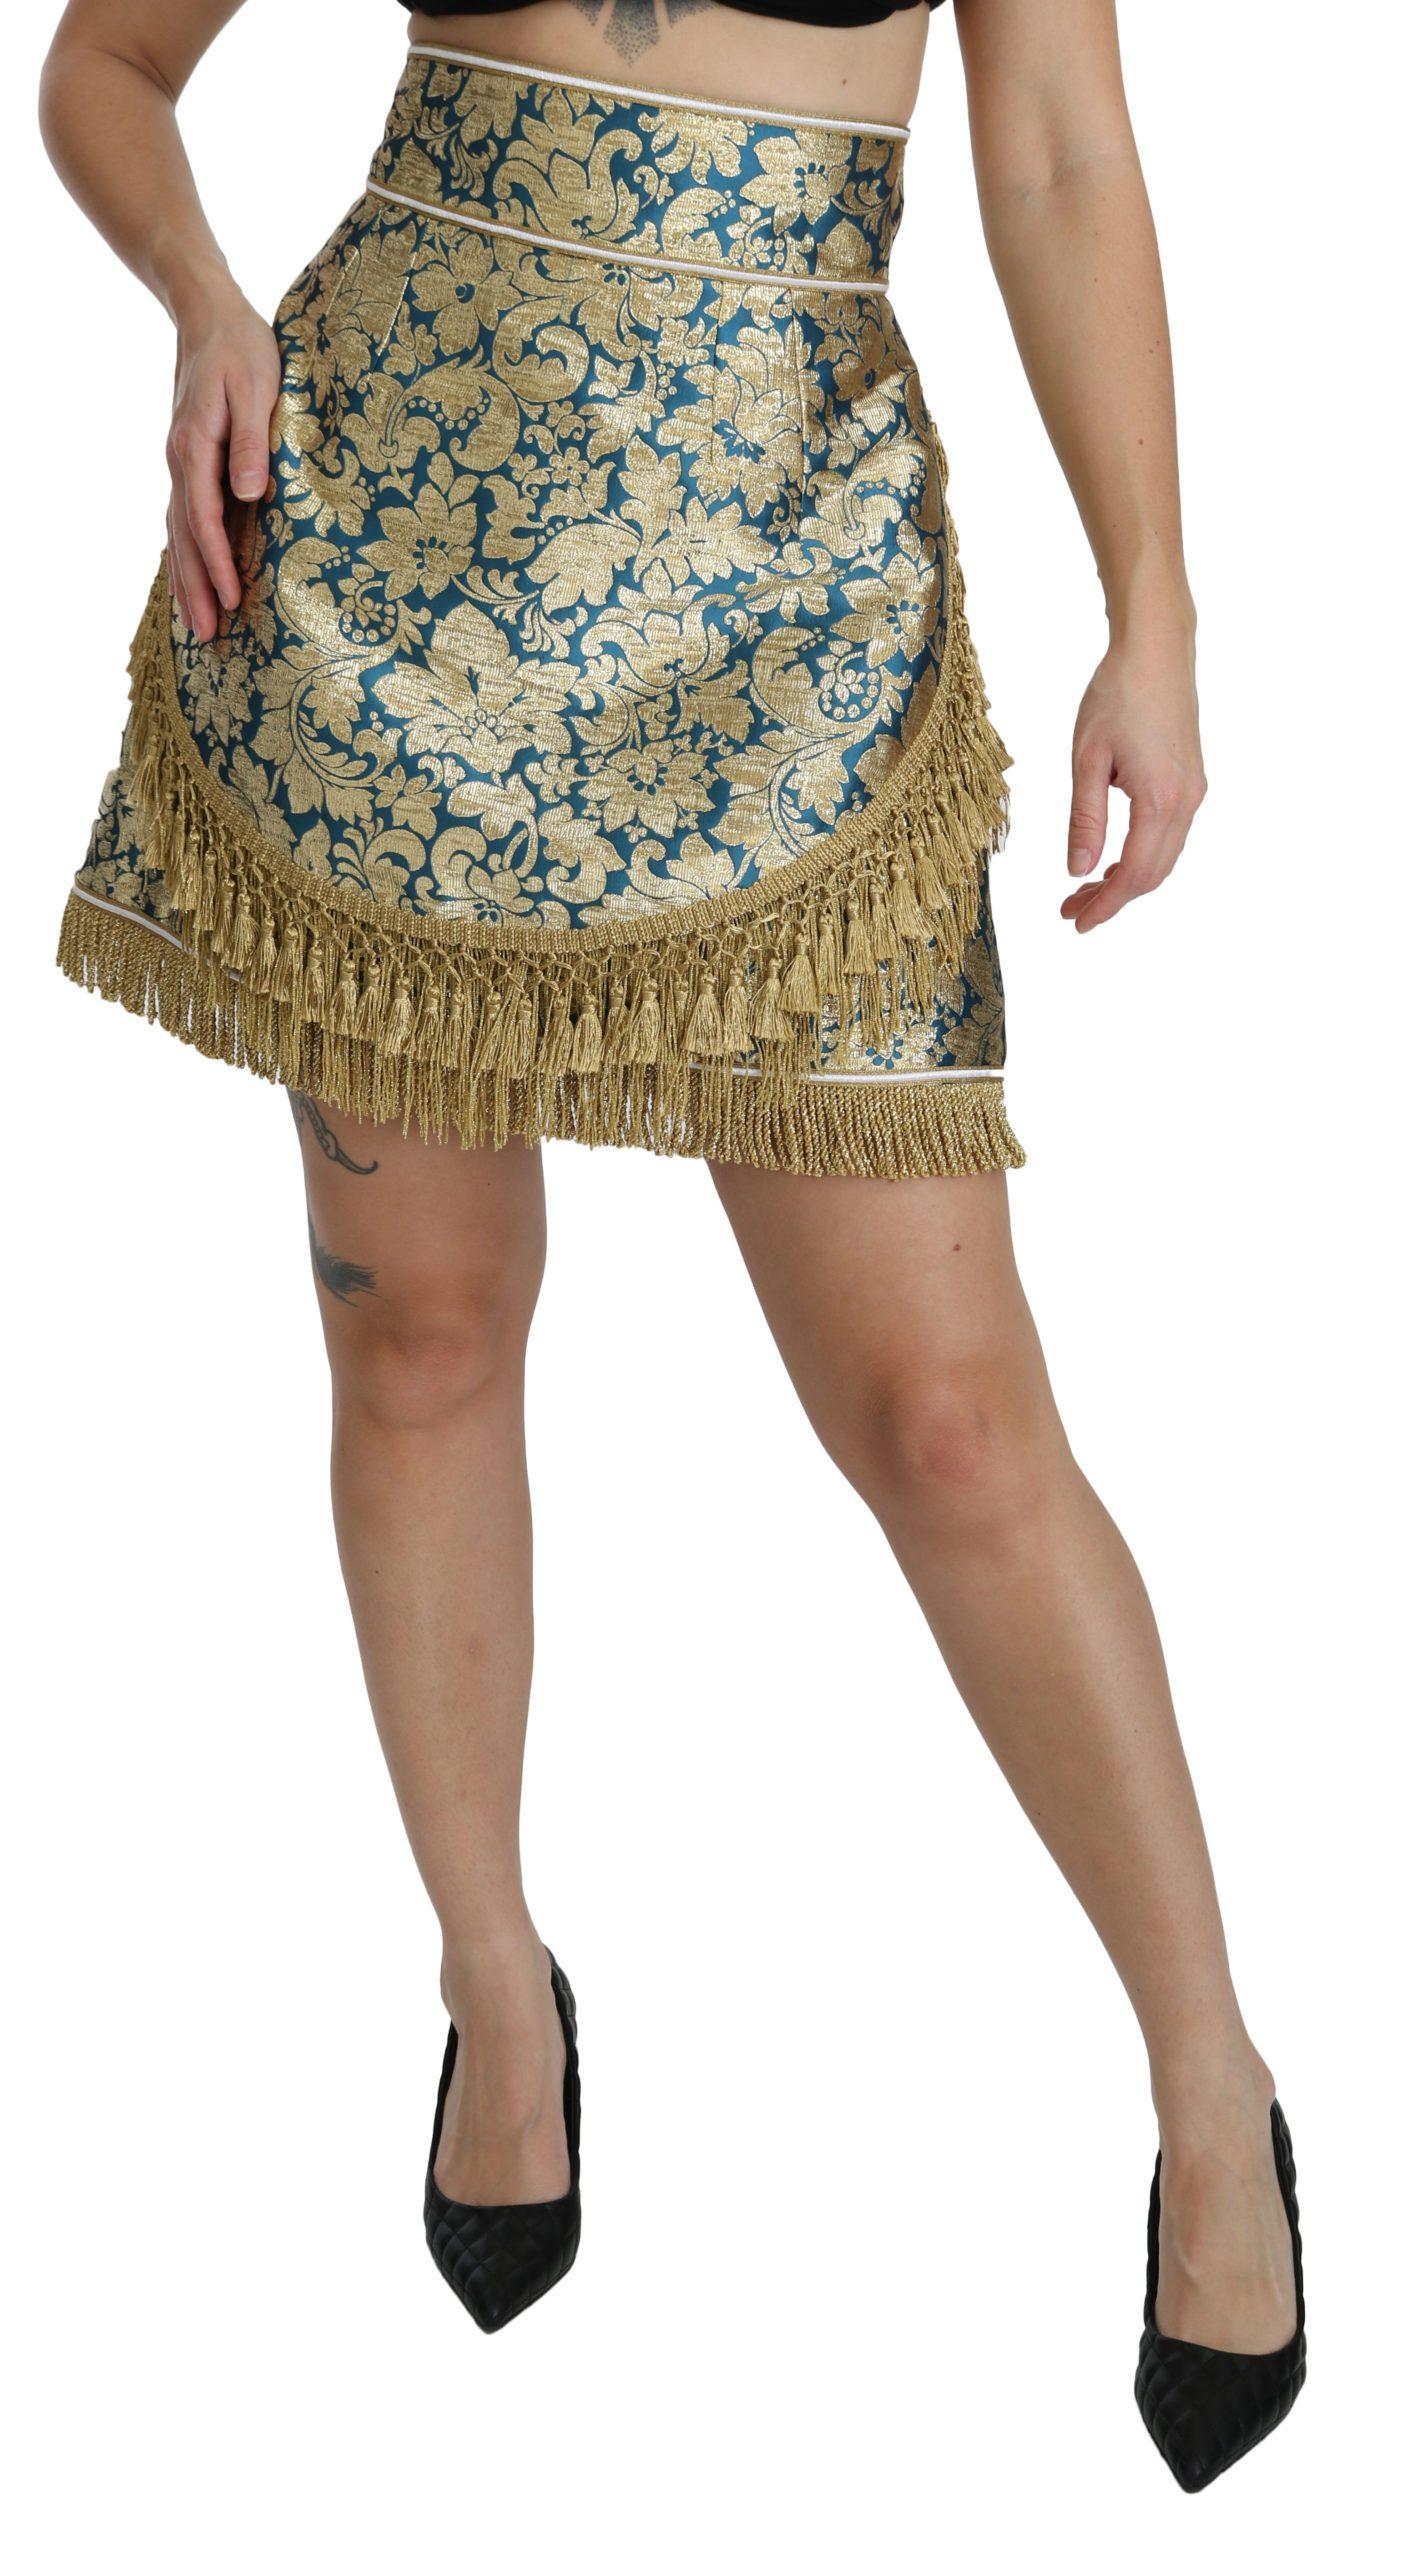 Dolce & Gabbana Women's Baroque Jacquard High Waist Mini Skirt Multicolor SKI1362 - IT40|S